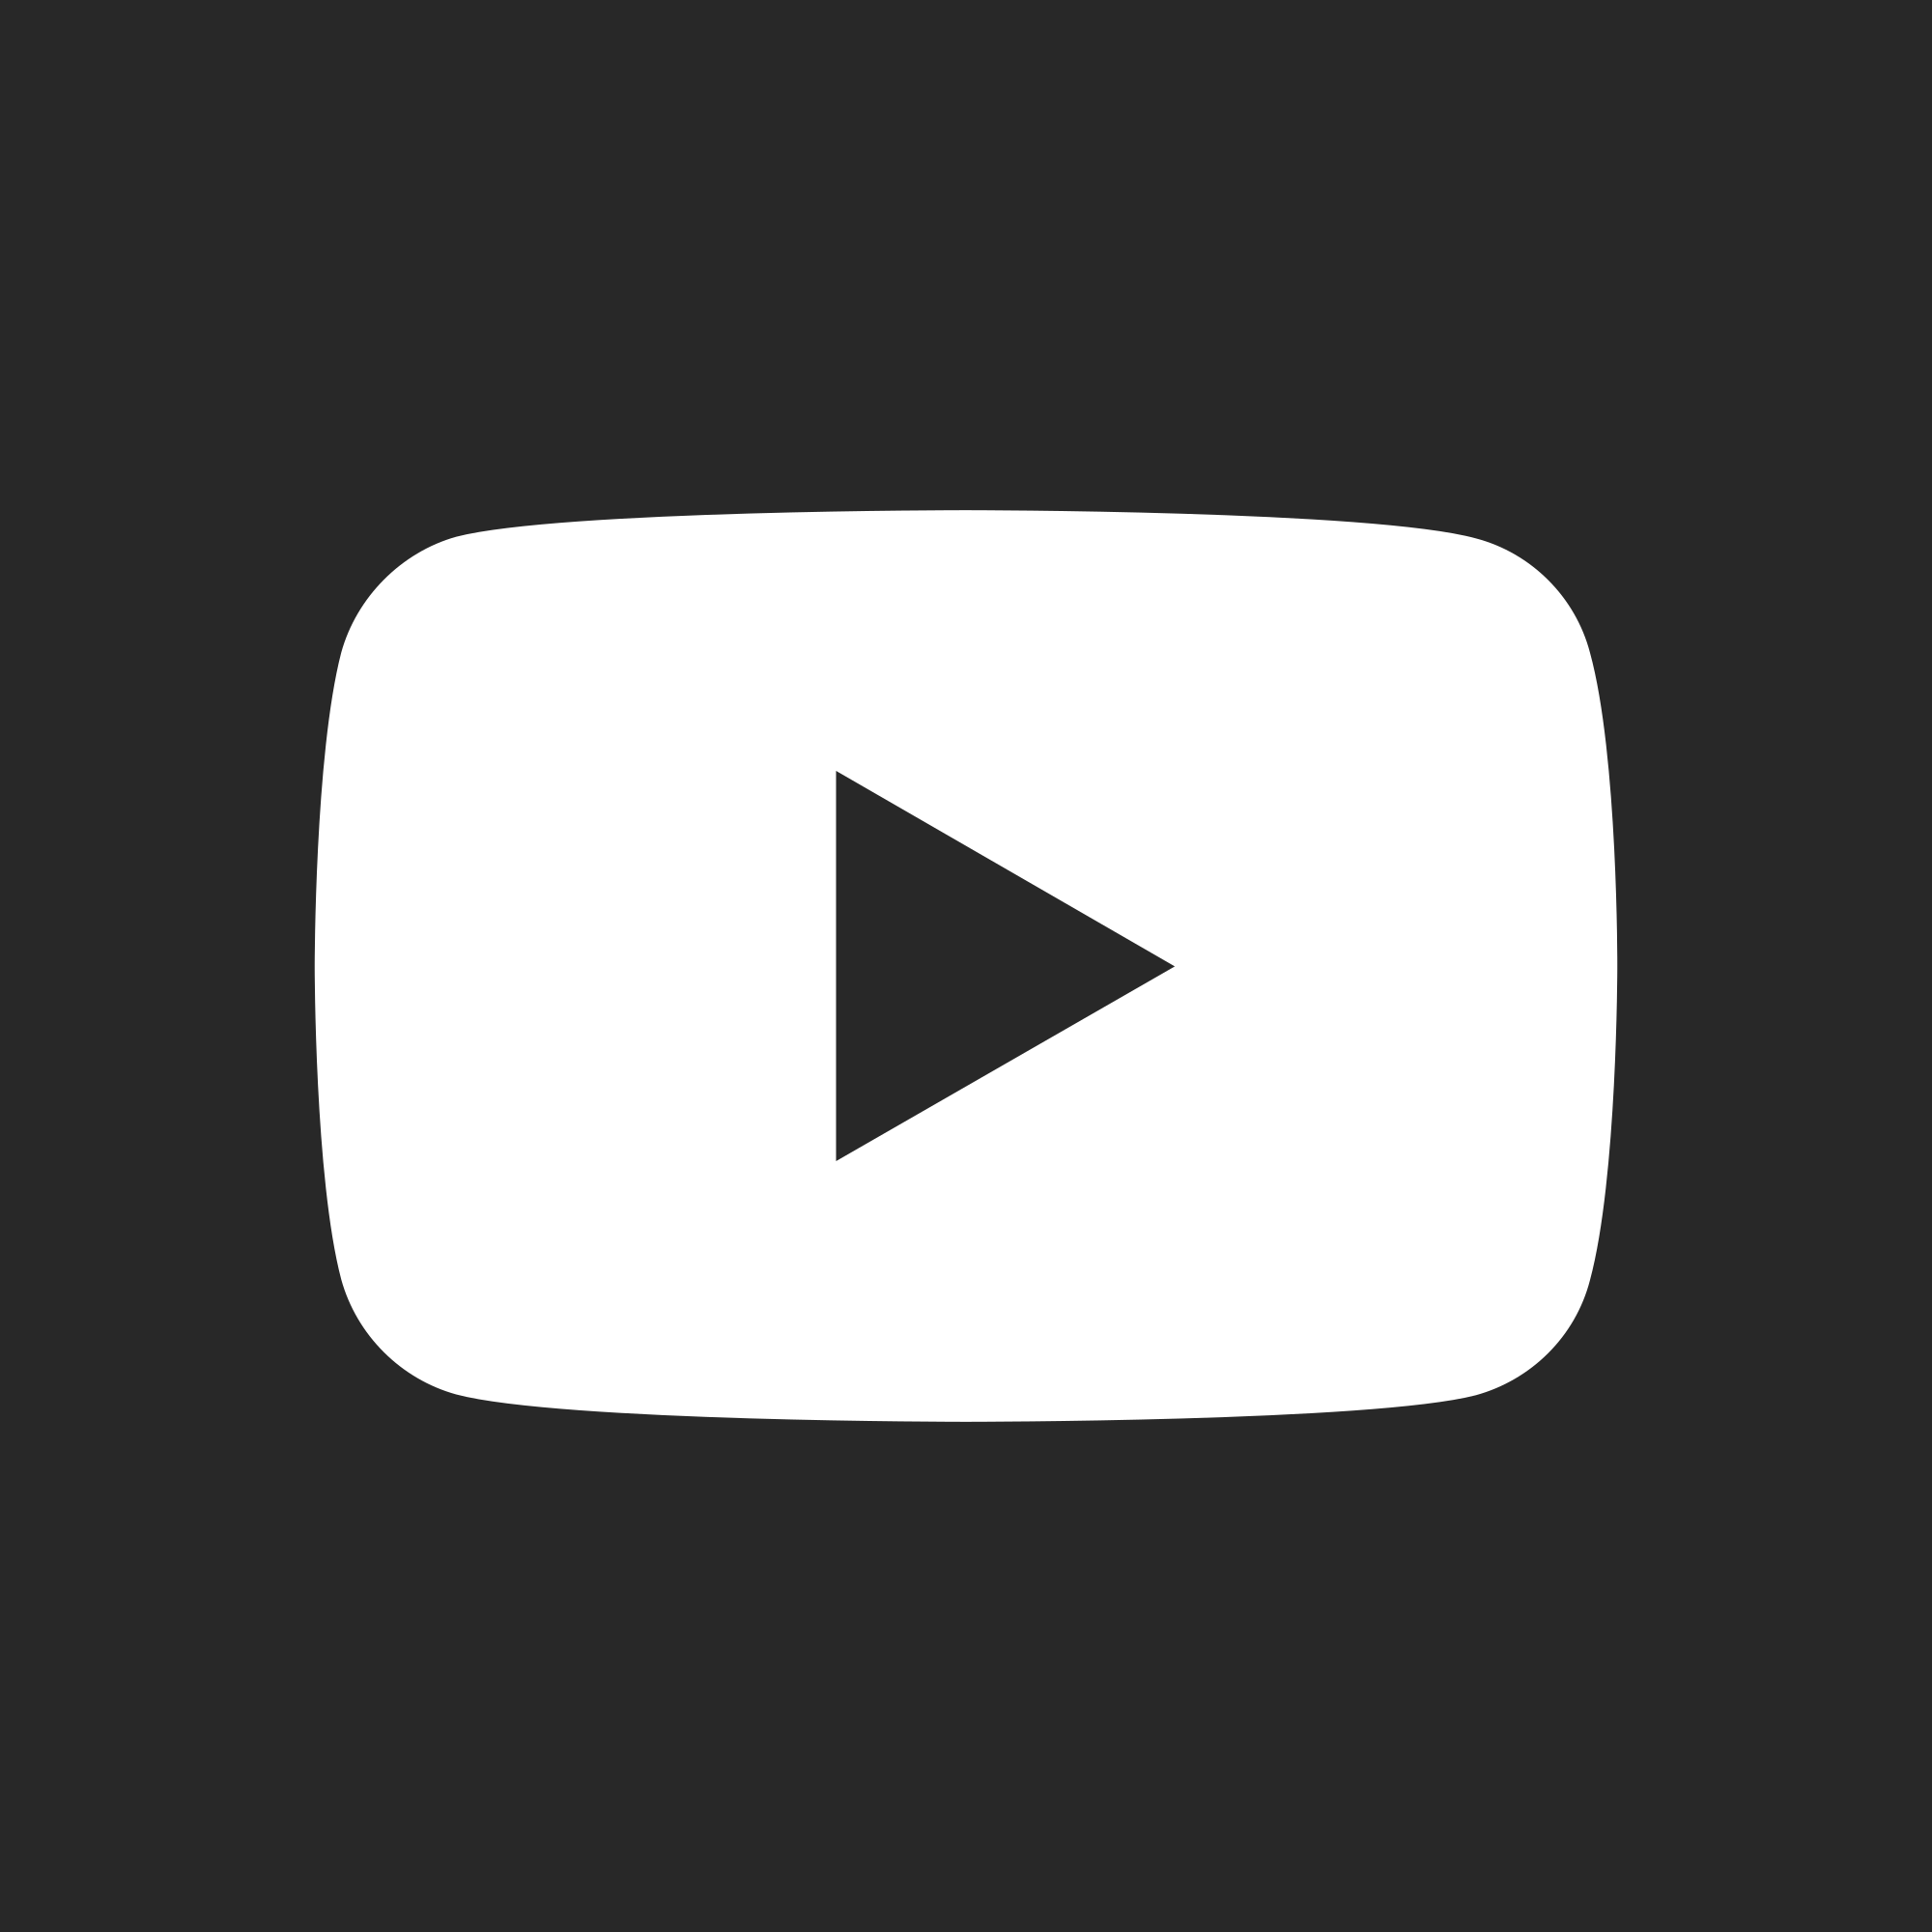 White Youtube Icon Png (+).